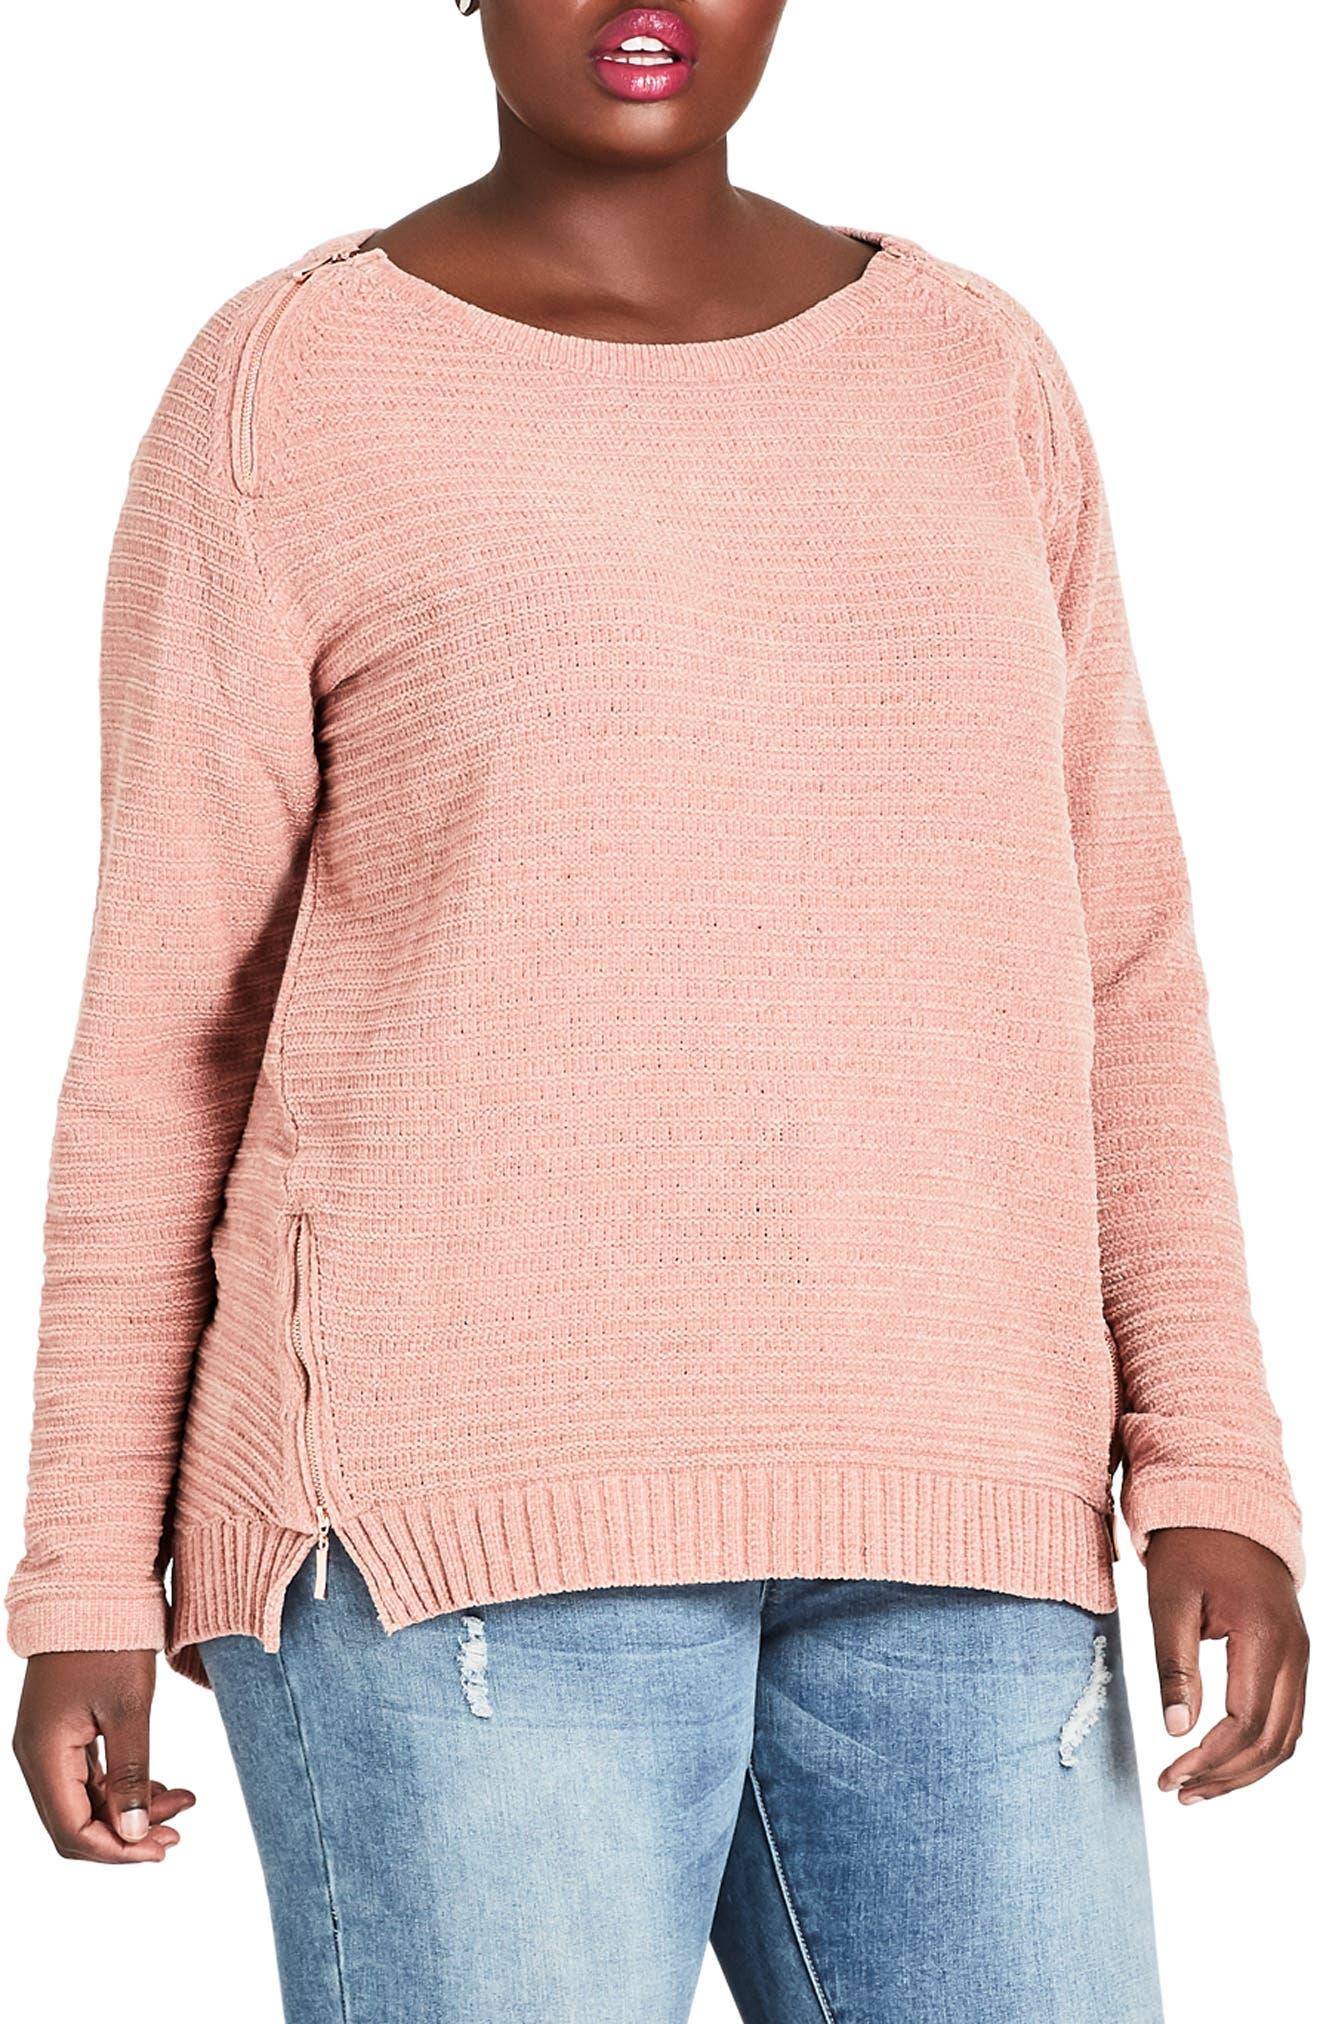 Zip Detail Sweater,                             Main thumbnail 1, color,                             DAINTY ROSE